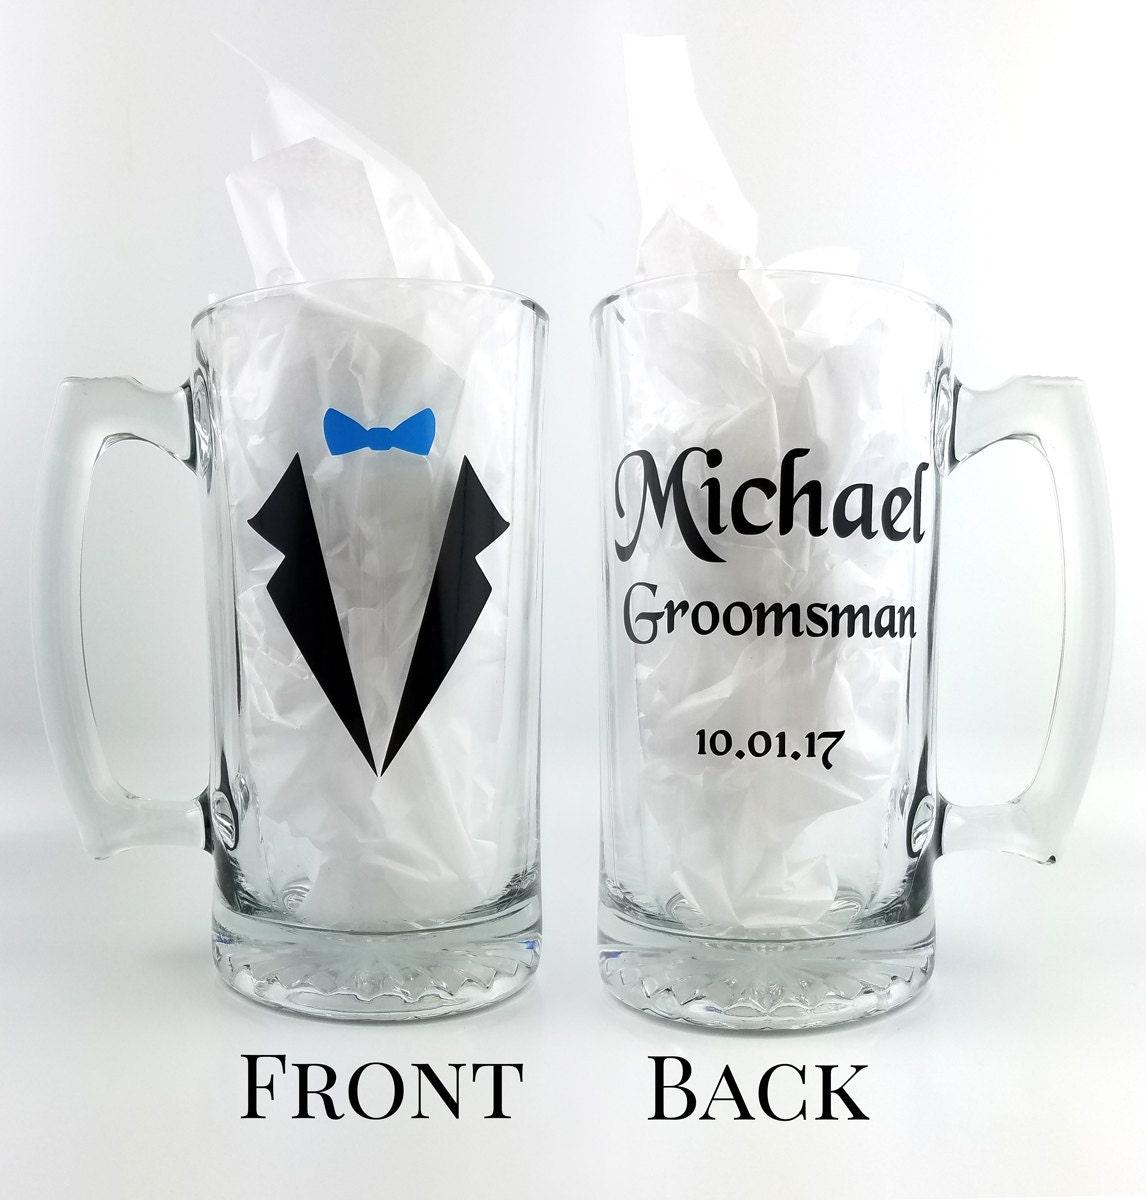 Personalized wedding Mugs - 26 oz beer mug with name role and ...